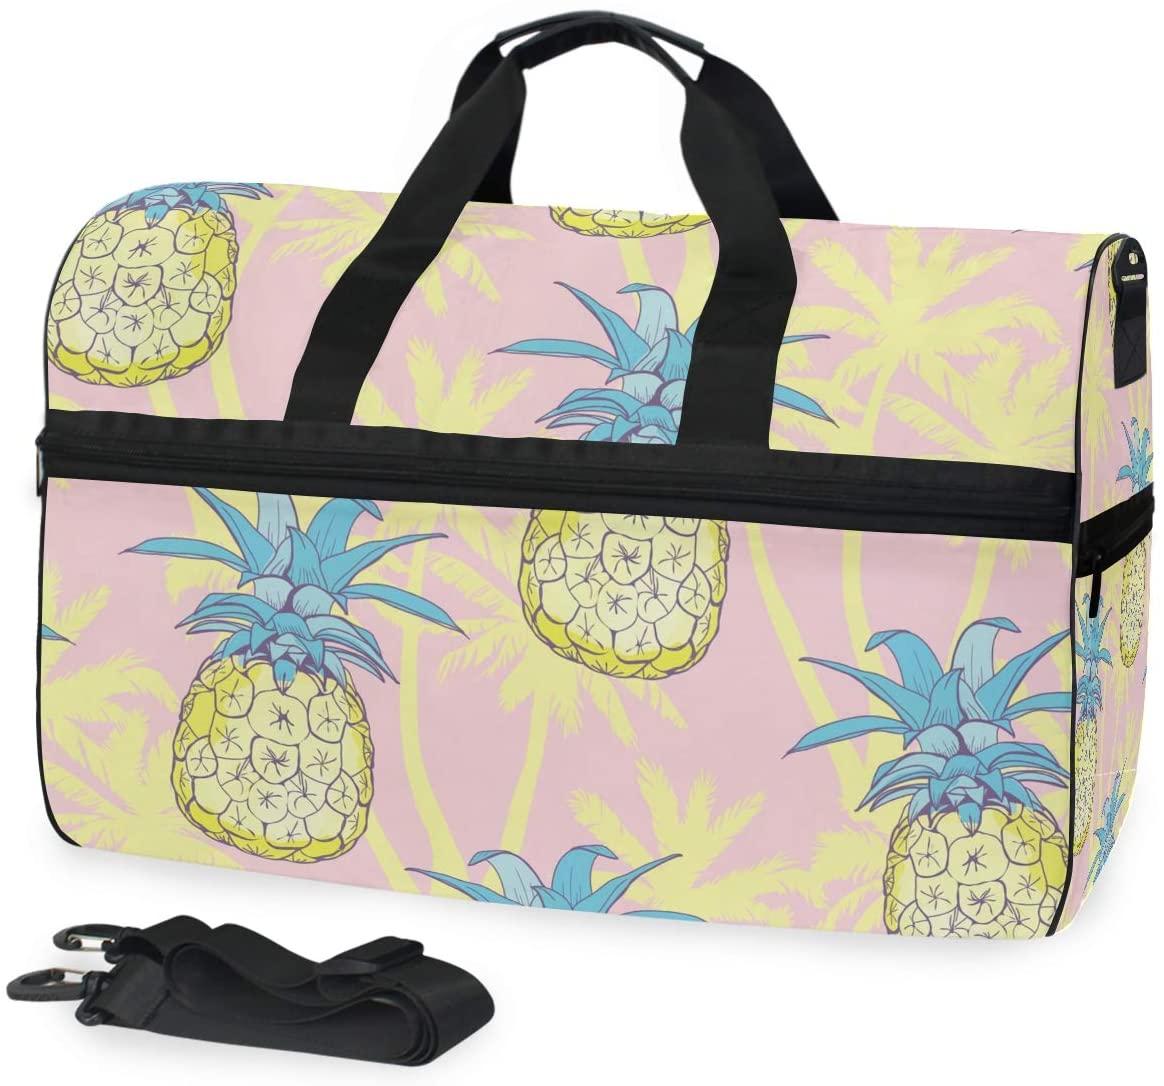 Travel Duffel Bag Summer Pineapple Yellow Luggae Sports Bag